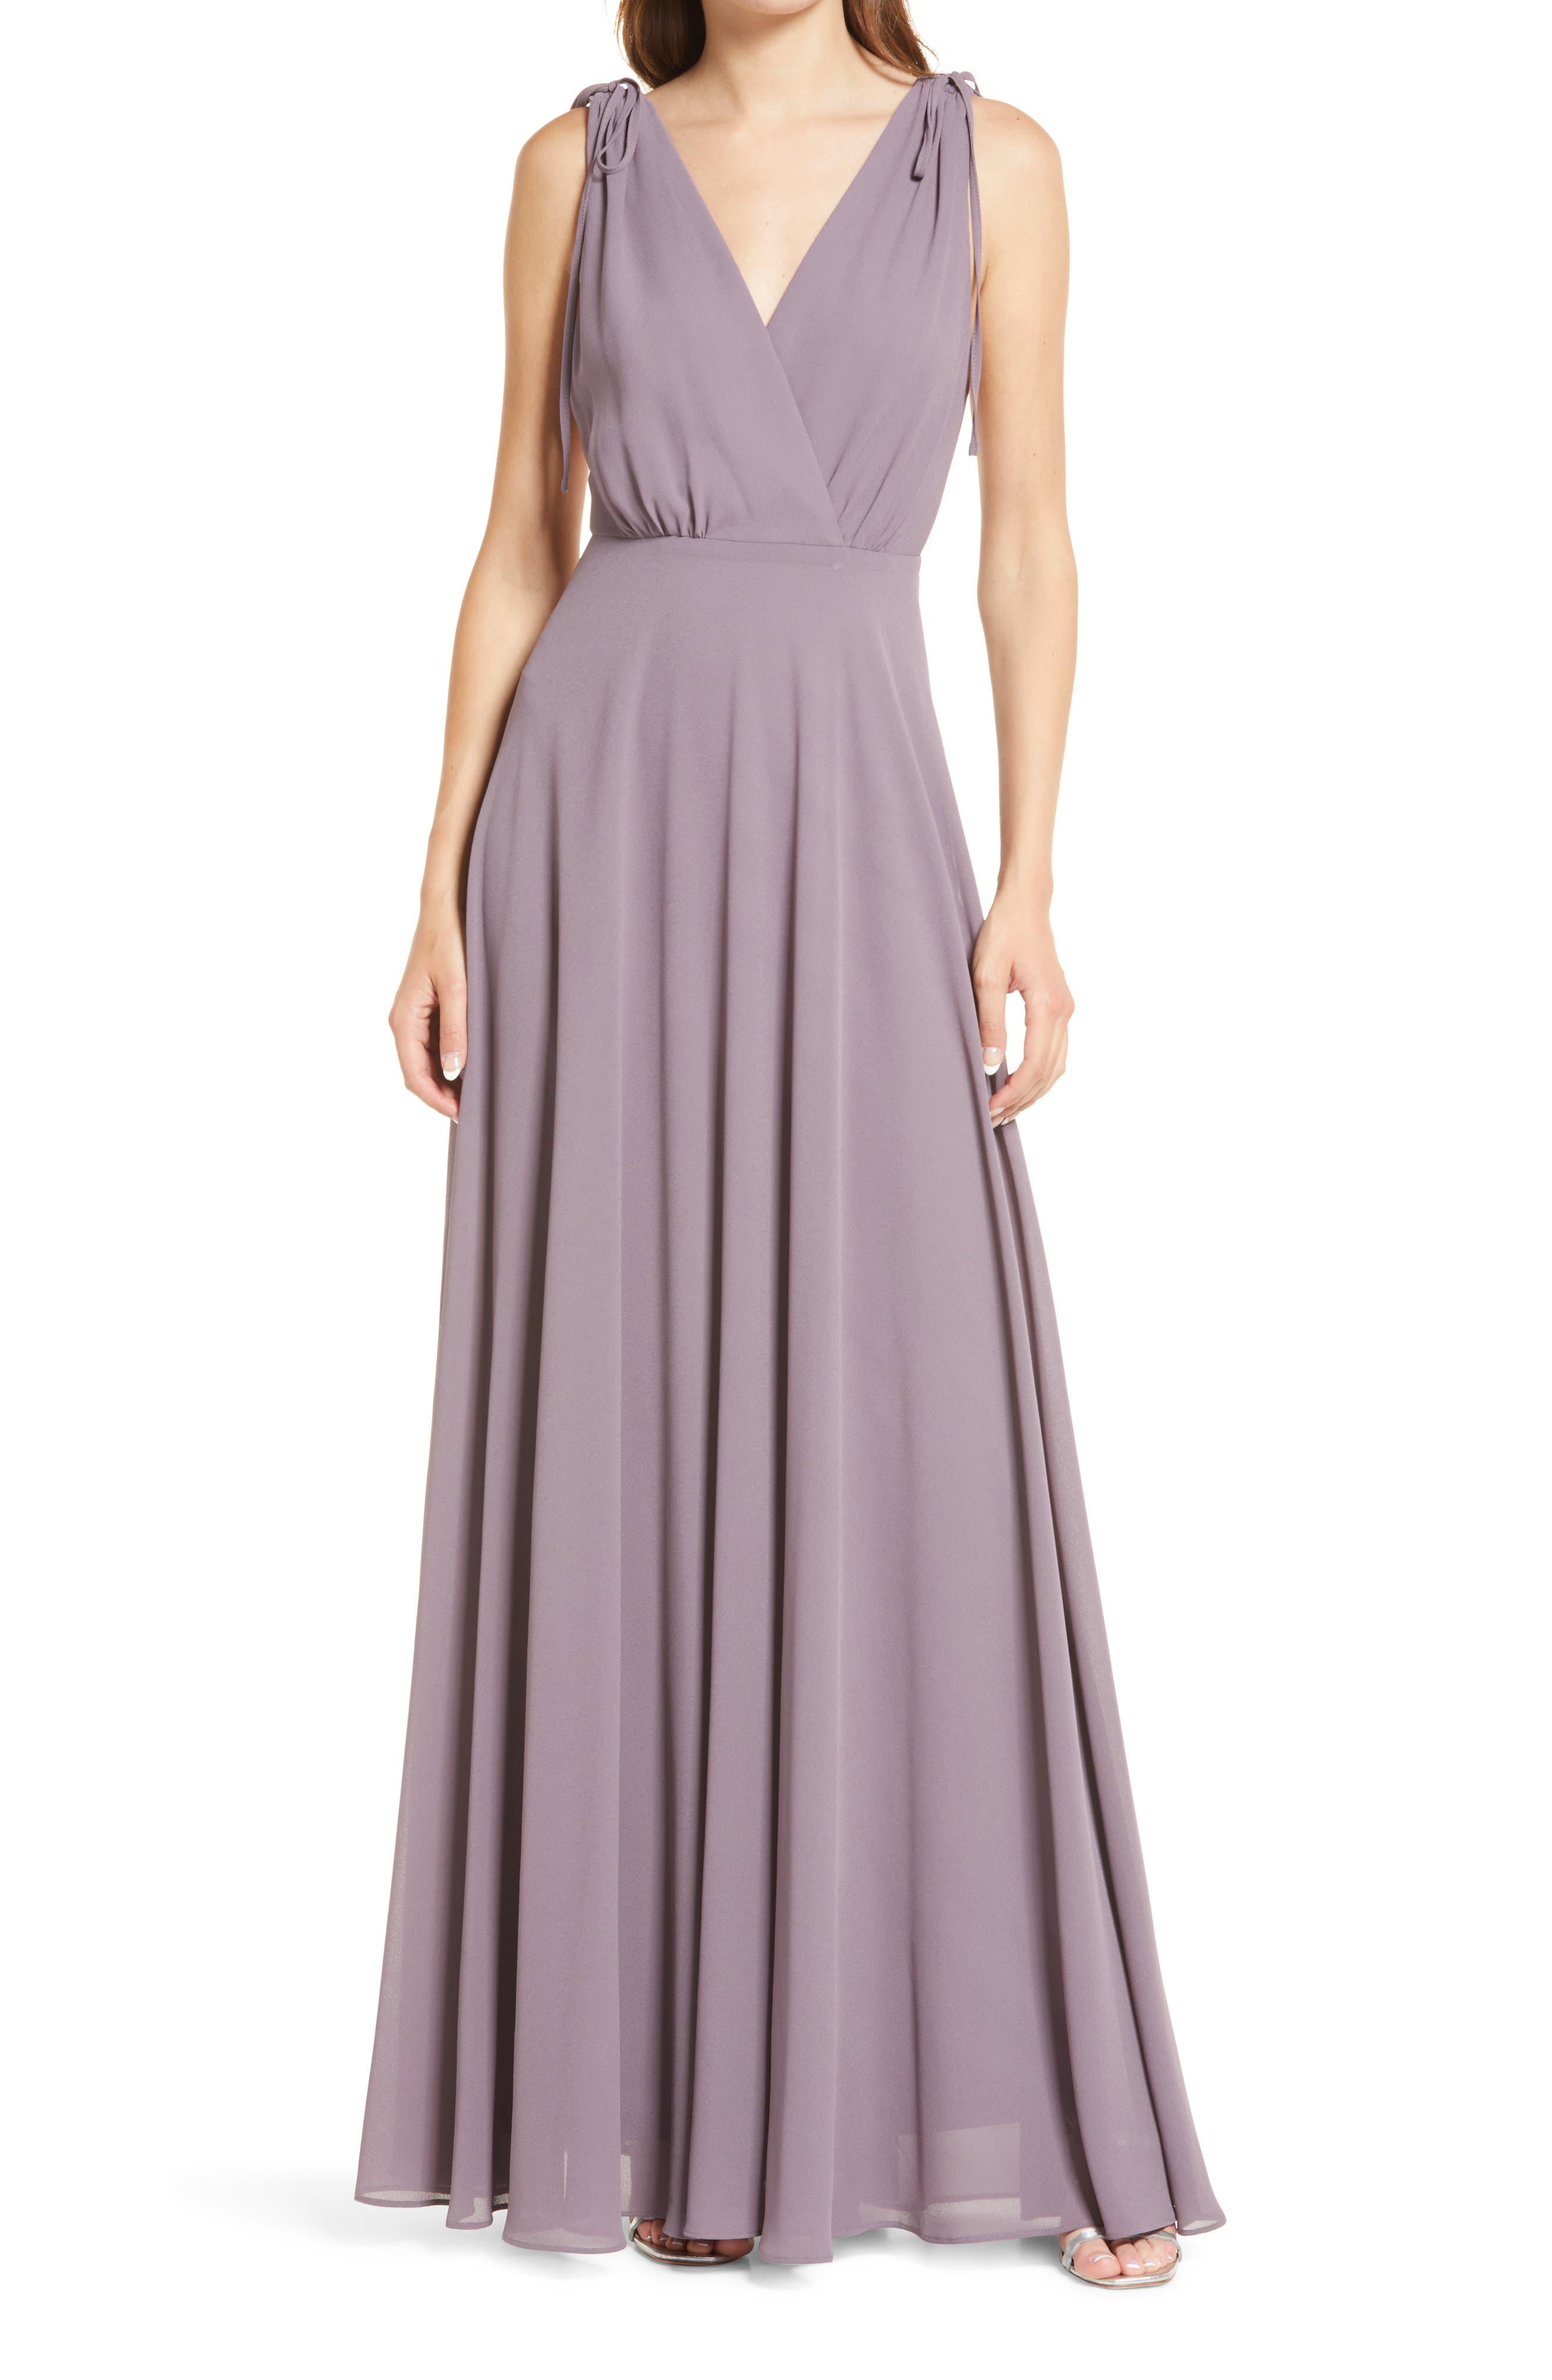 1940s Style Wedding Dresses | Classic Wedding Dresses Womens Lulus V-Neck Chiffon Gown Size Small - Purple $88.00 AT vintagedancer.com